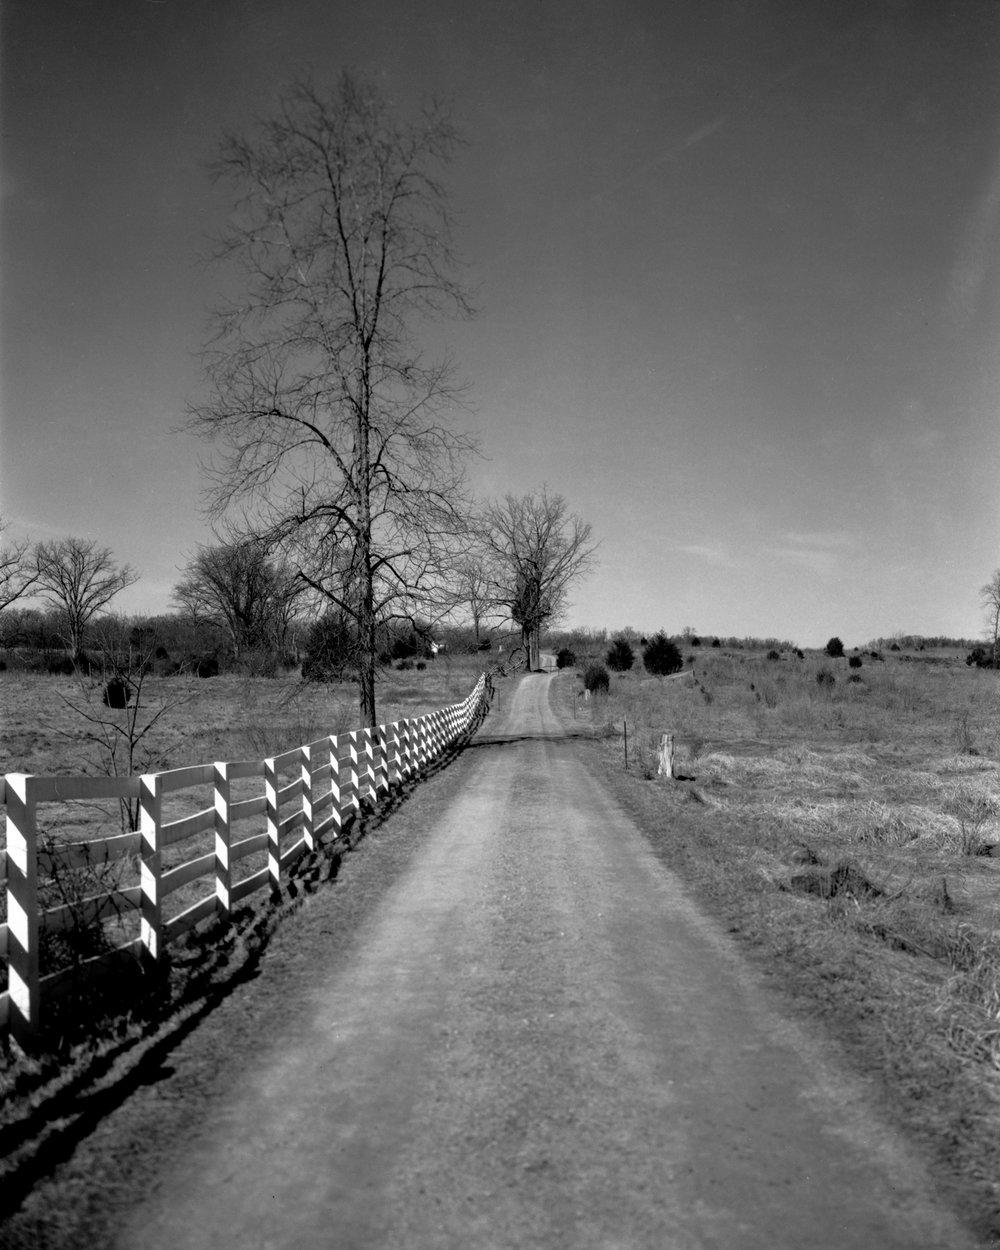 John Slyder Farm. Gettysburg, Pennsylvania.